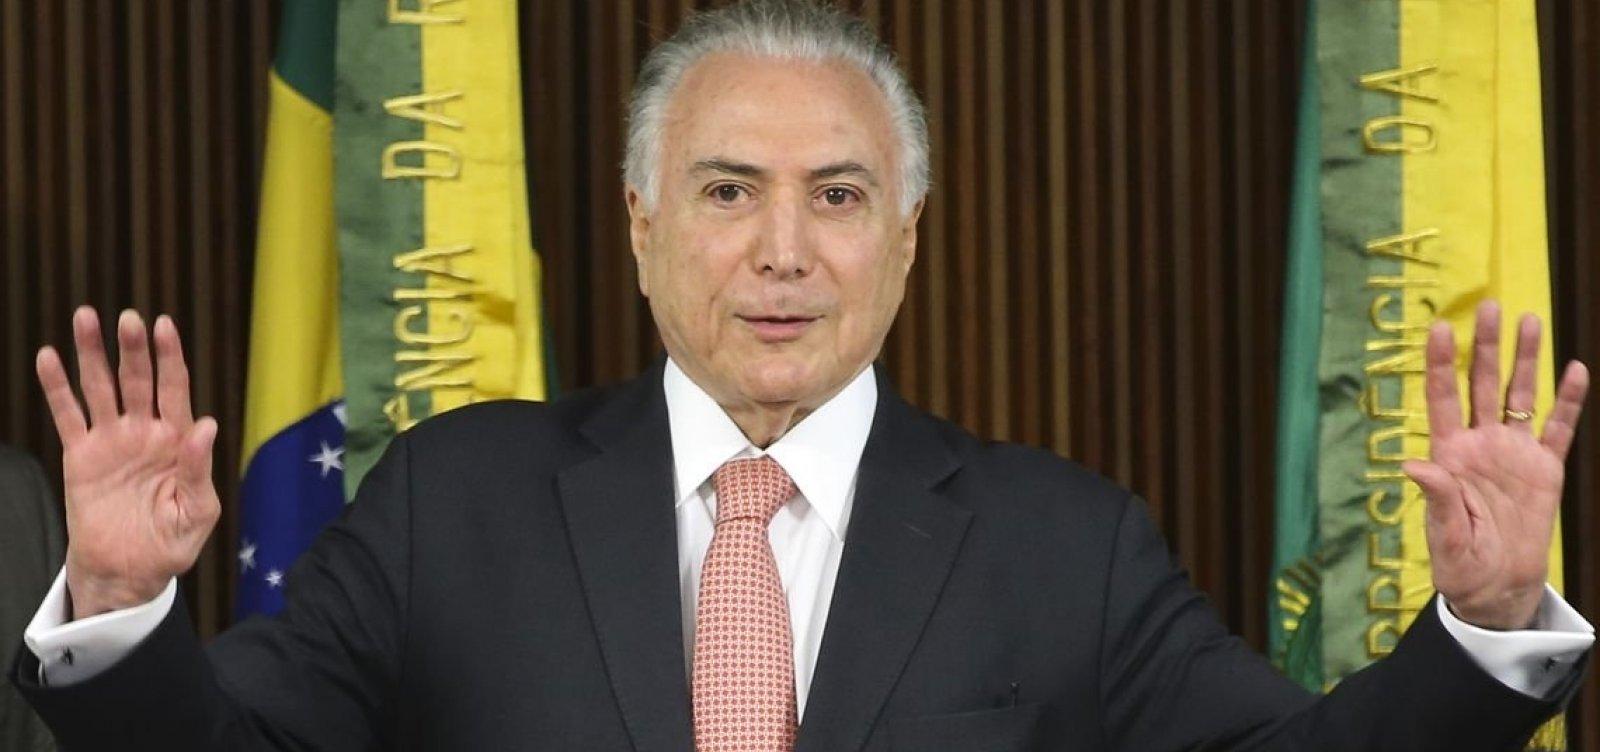 [Ministro do STJ se declara impedido para julgar liberdade de Temer]